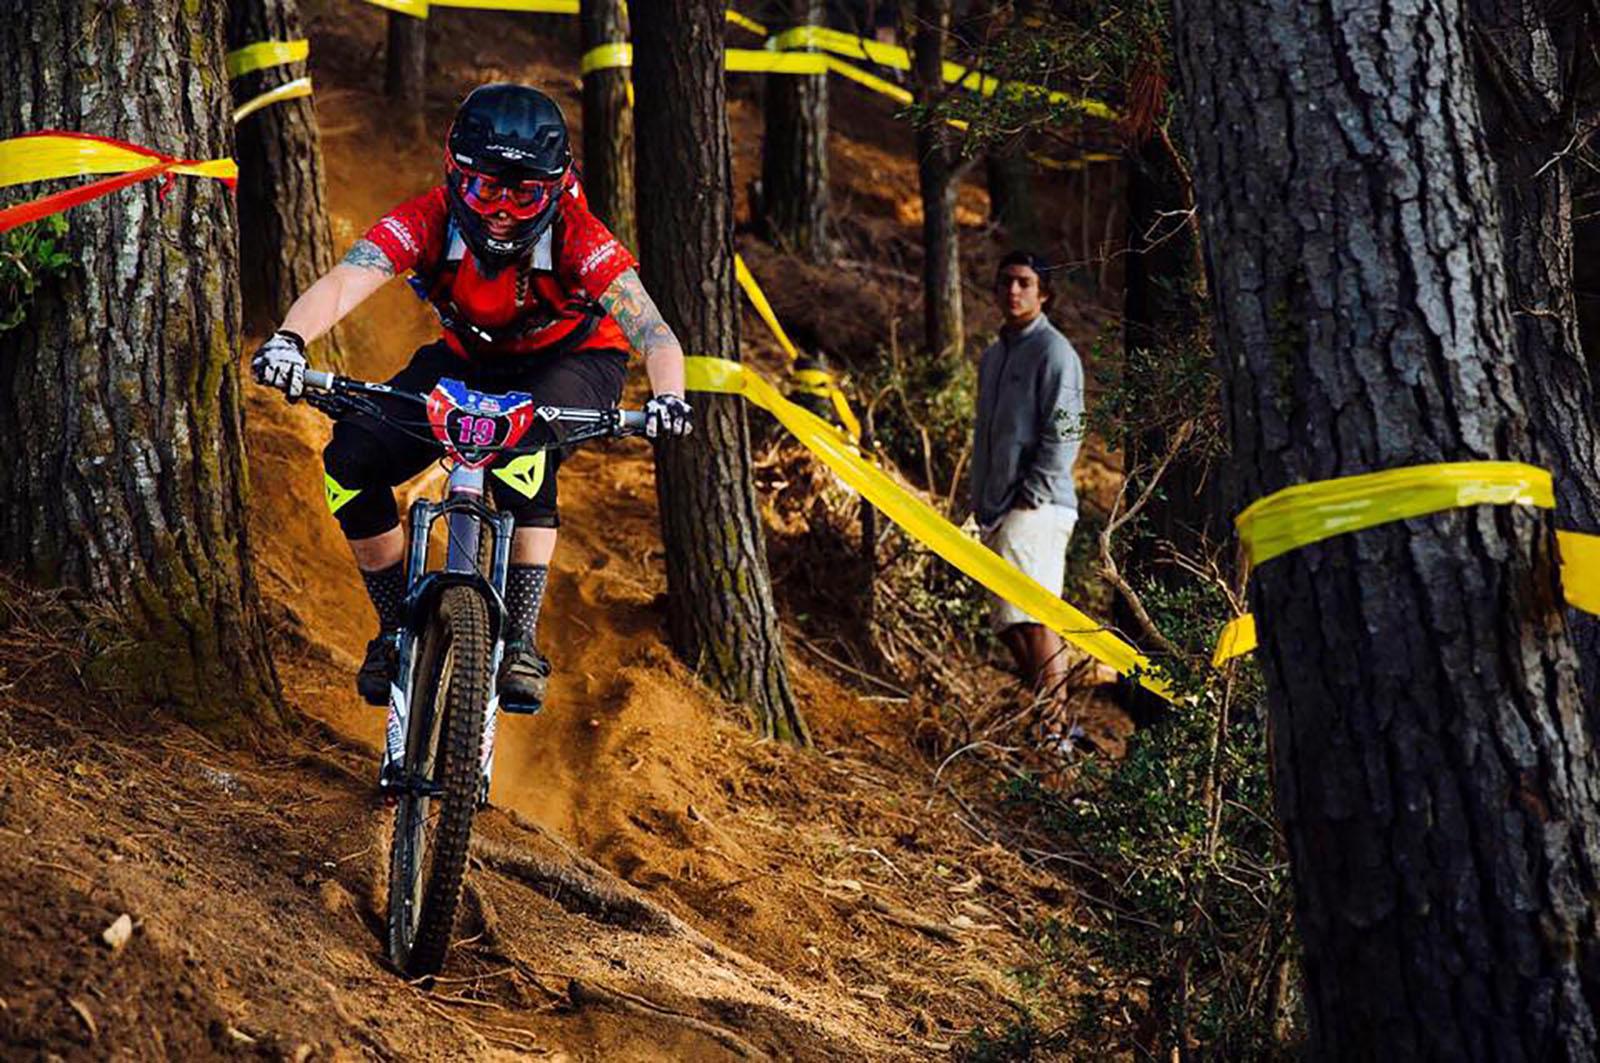 Juliana Bicycles - Sarah Leishman at Corral, Chile EWS